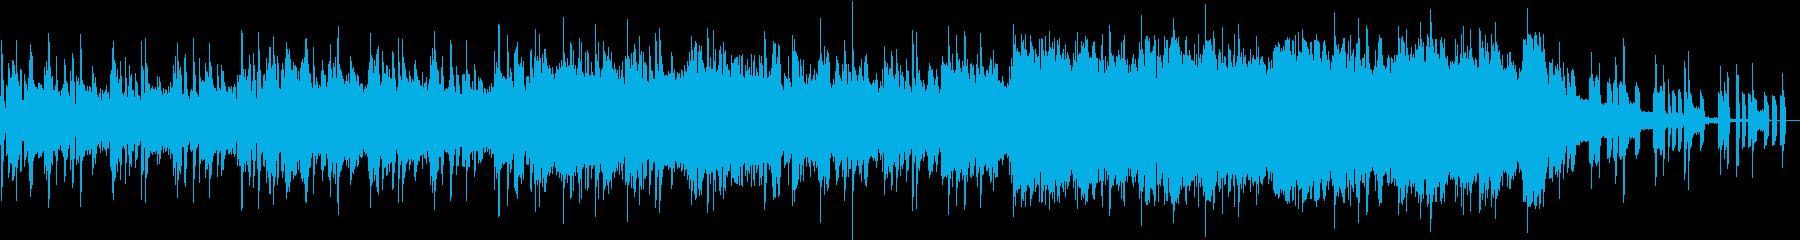 EDMとギターロックが融合したシングルの再生済みの波形